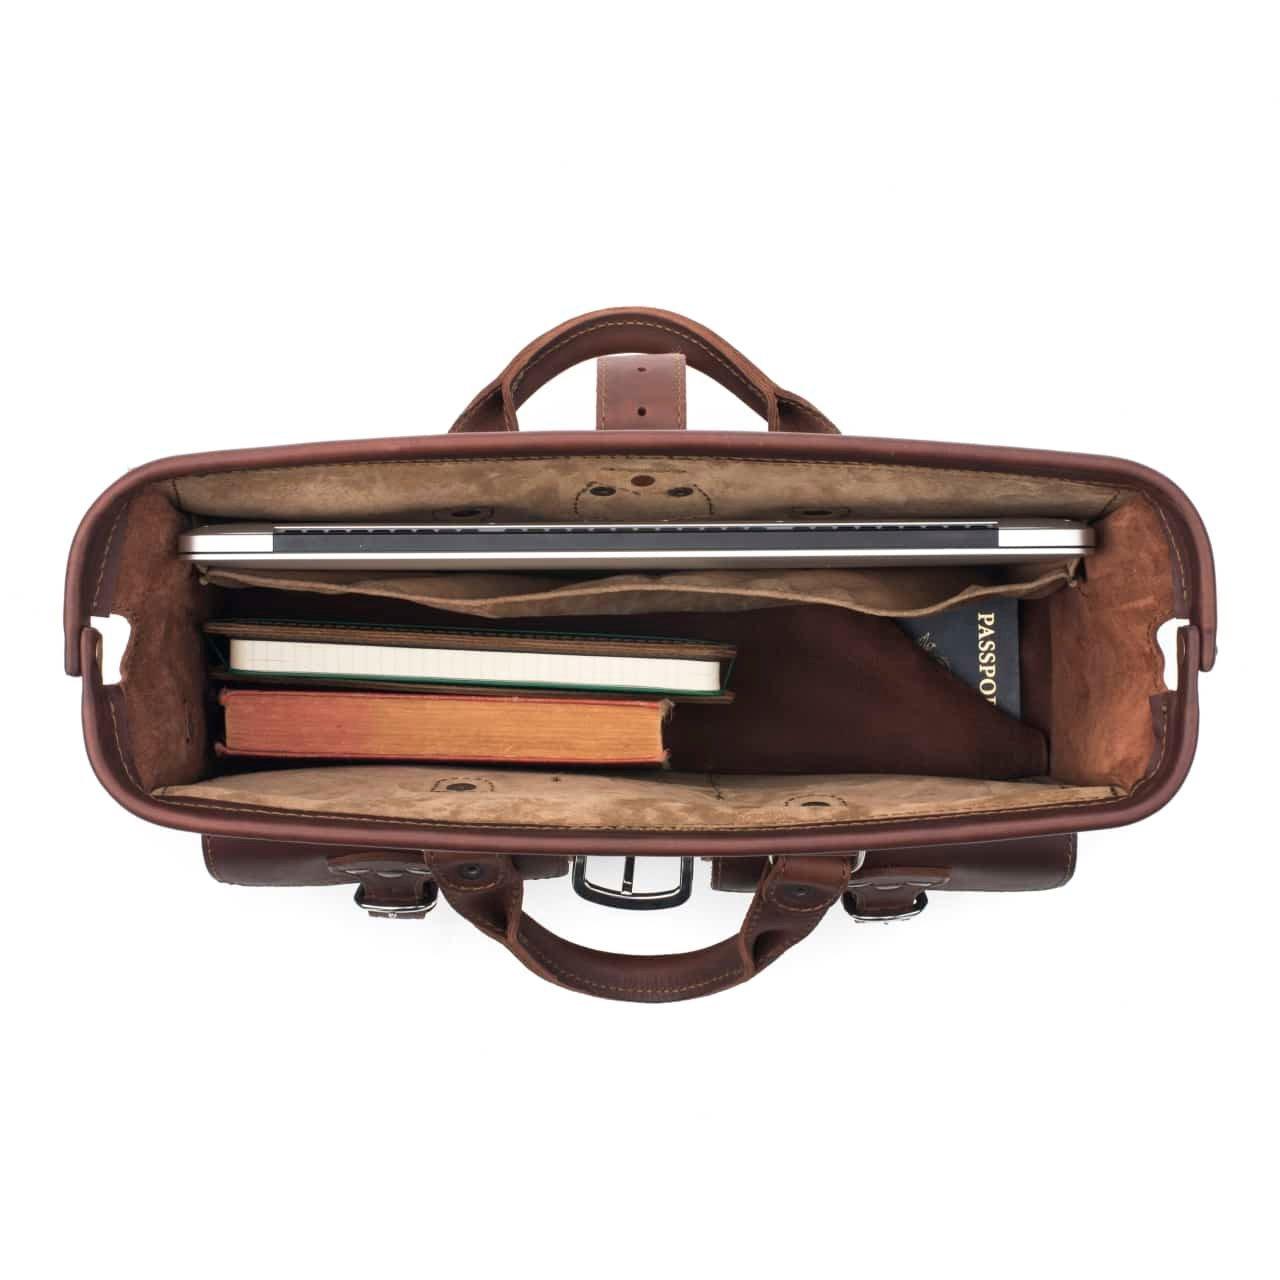 Saddleback Leather Co. Flight Bag 15-inch Full Grain Leather Expandable Laptop Briefcase for Men Includes 100 Year Warranty by Saddleback Leather Co. (Image #4)